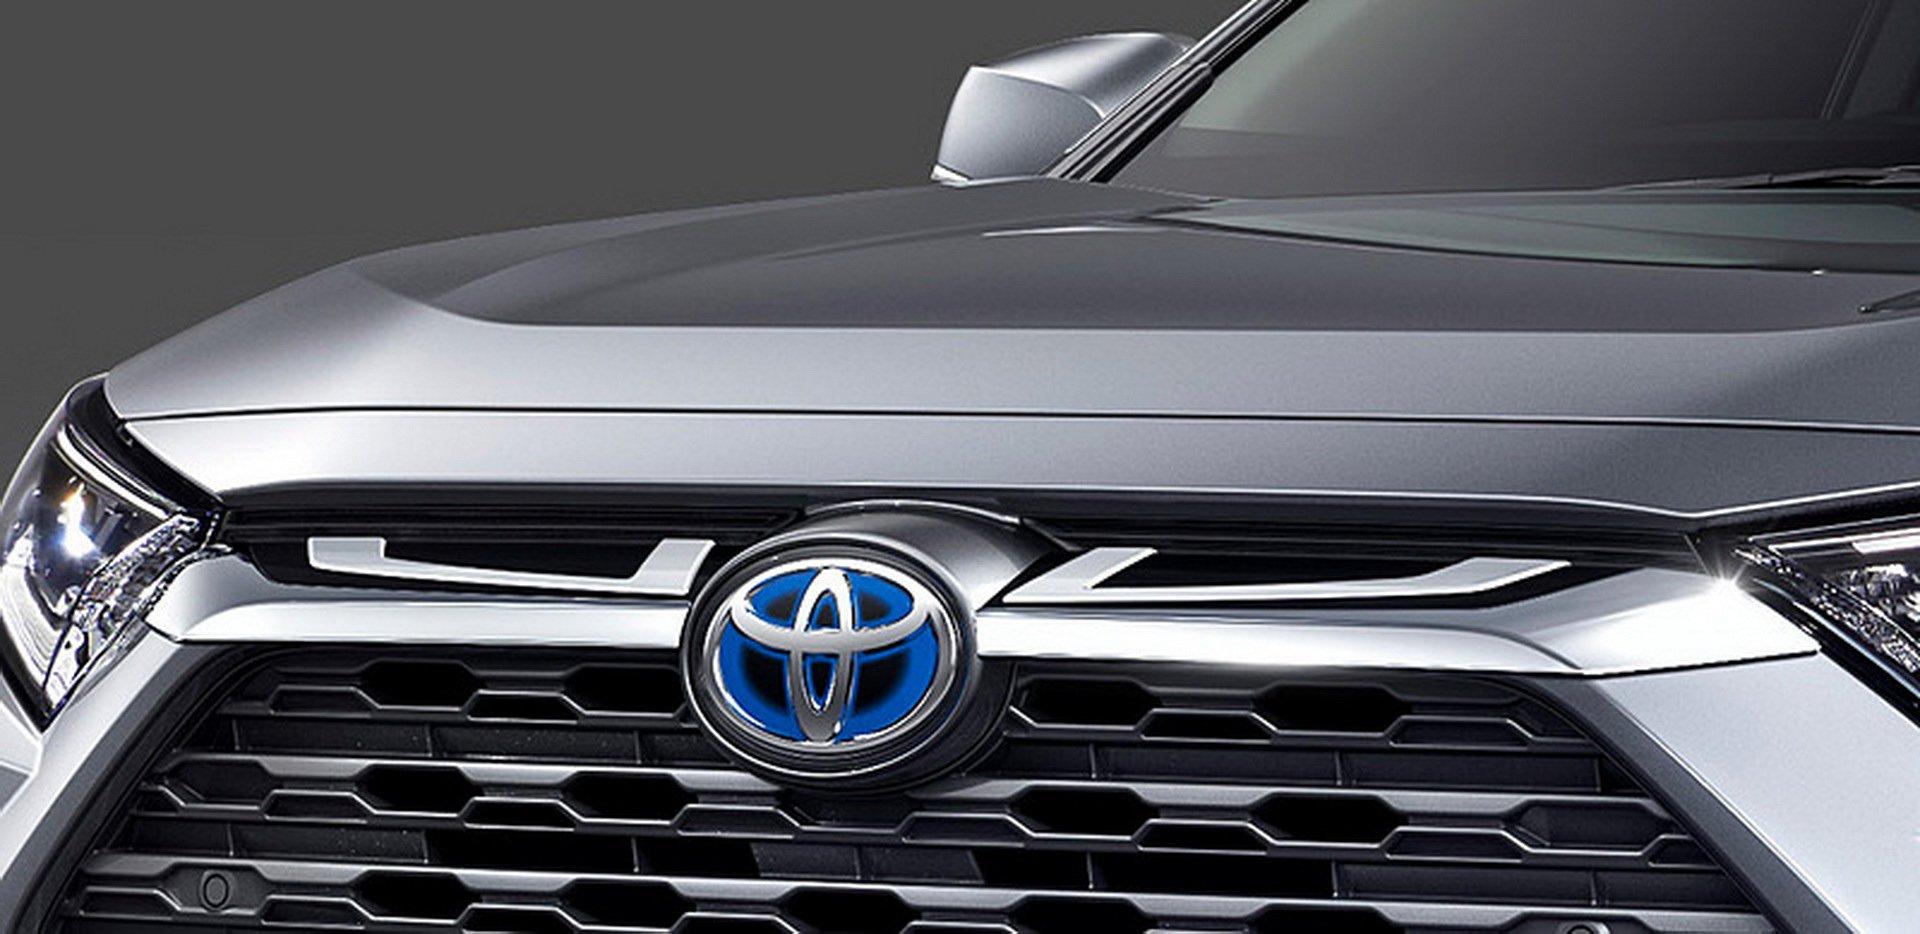 Toyota-RAV4-TRD-and-Modellista-12